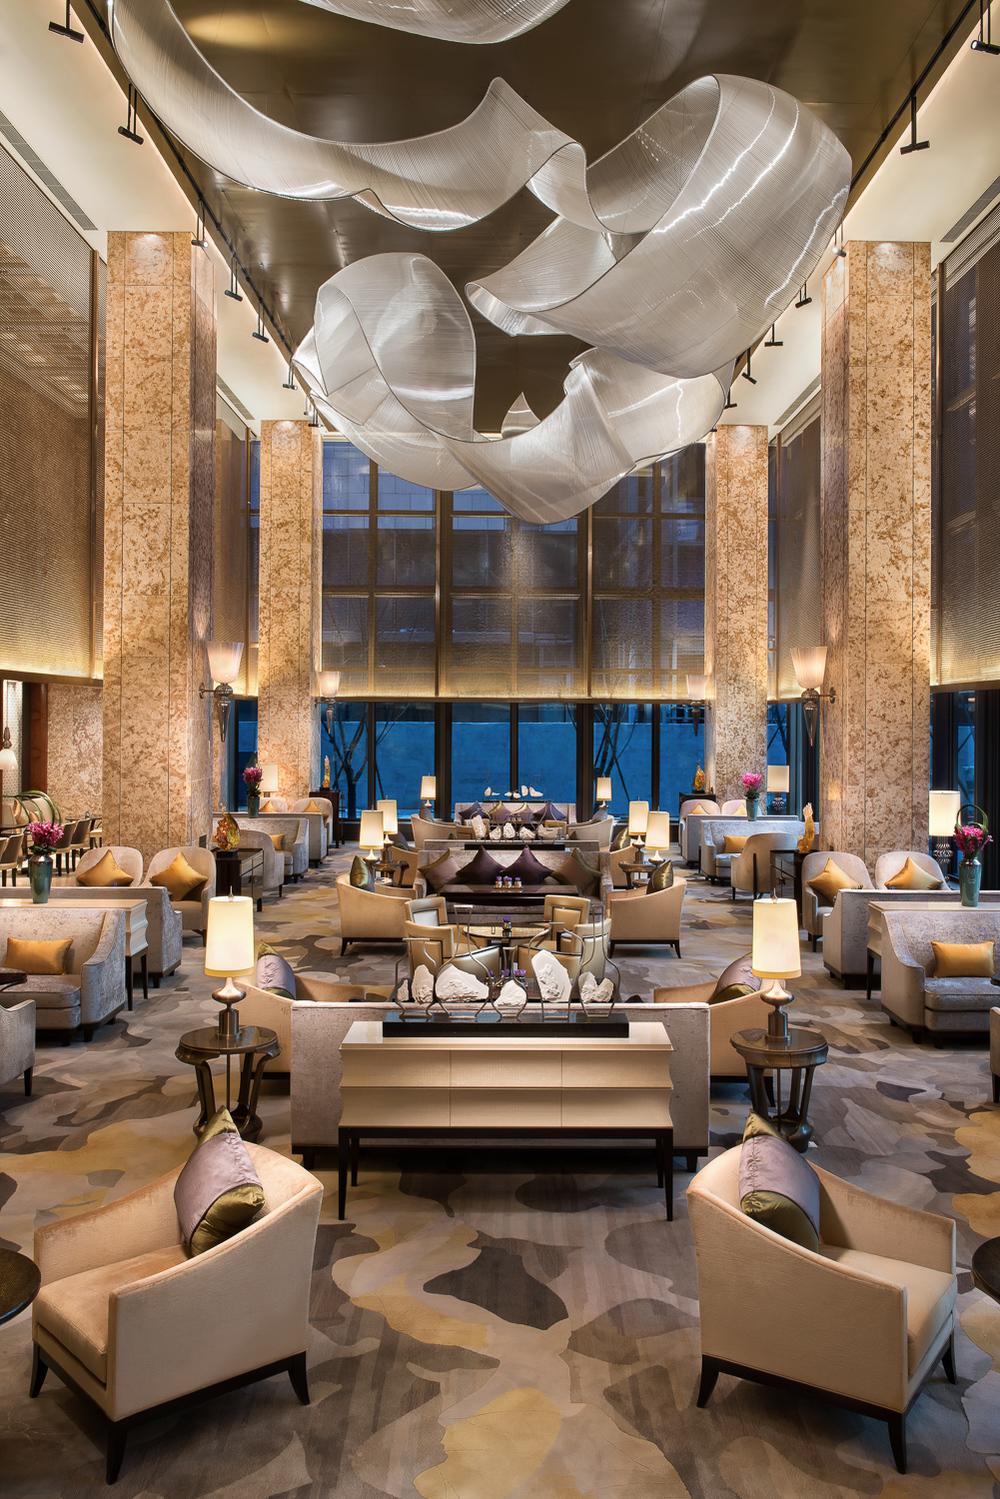 20160228_Shnagri-La_Lobby-Lounge.jpg